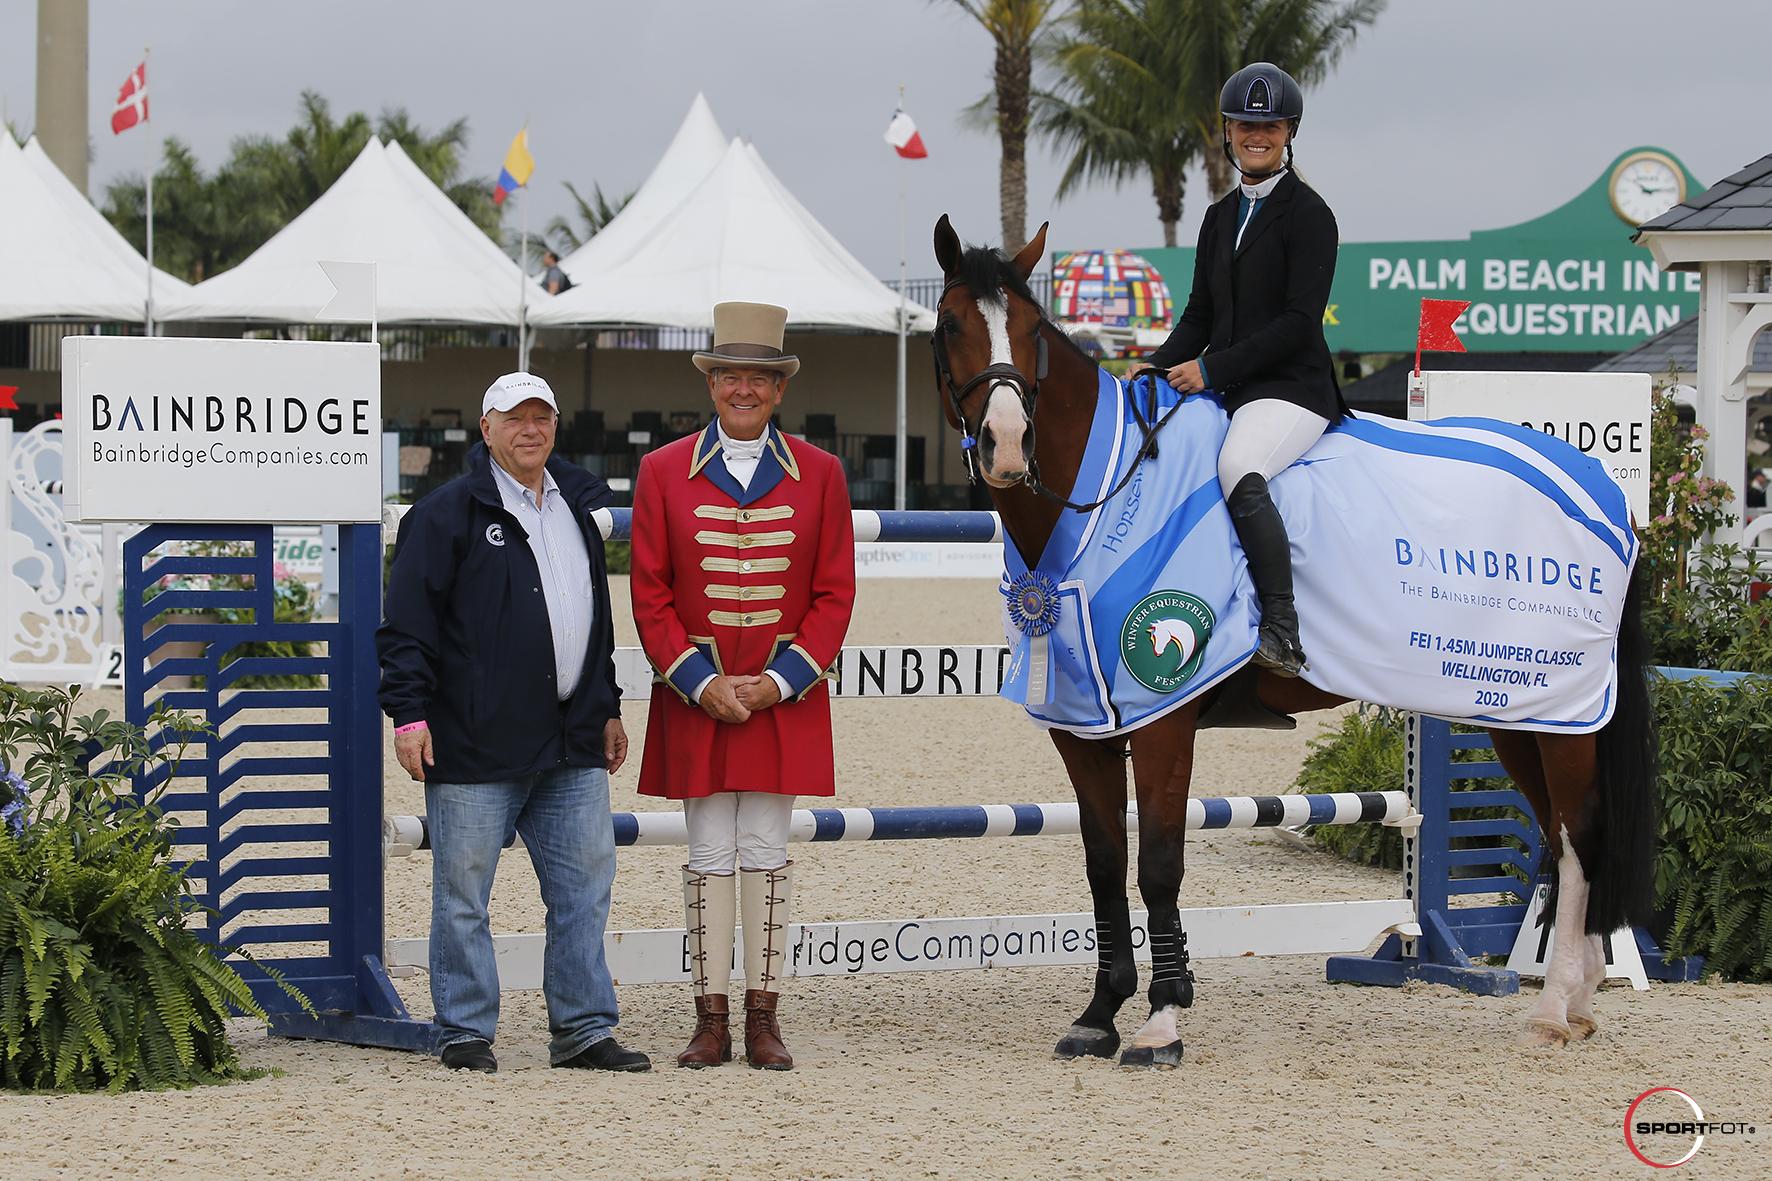 Kristen VanderVeen with Ringmaster Steve Rector and Richard Schechter, Chairman and CEO of Bainbridge Companies